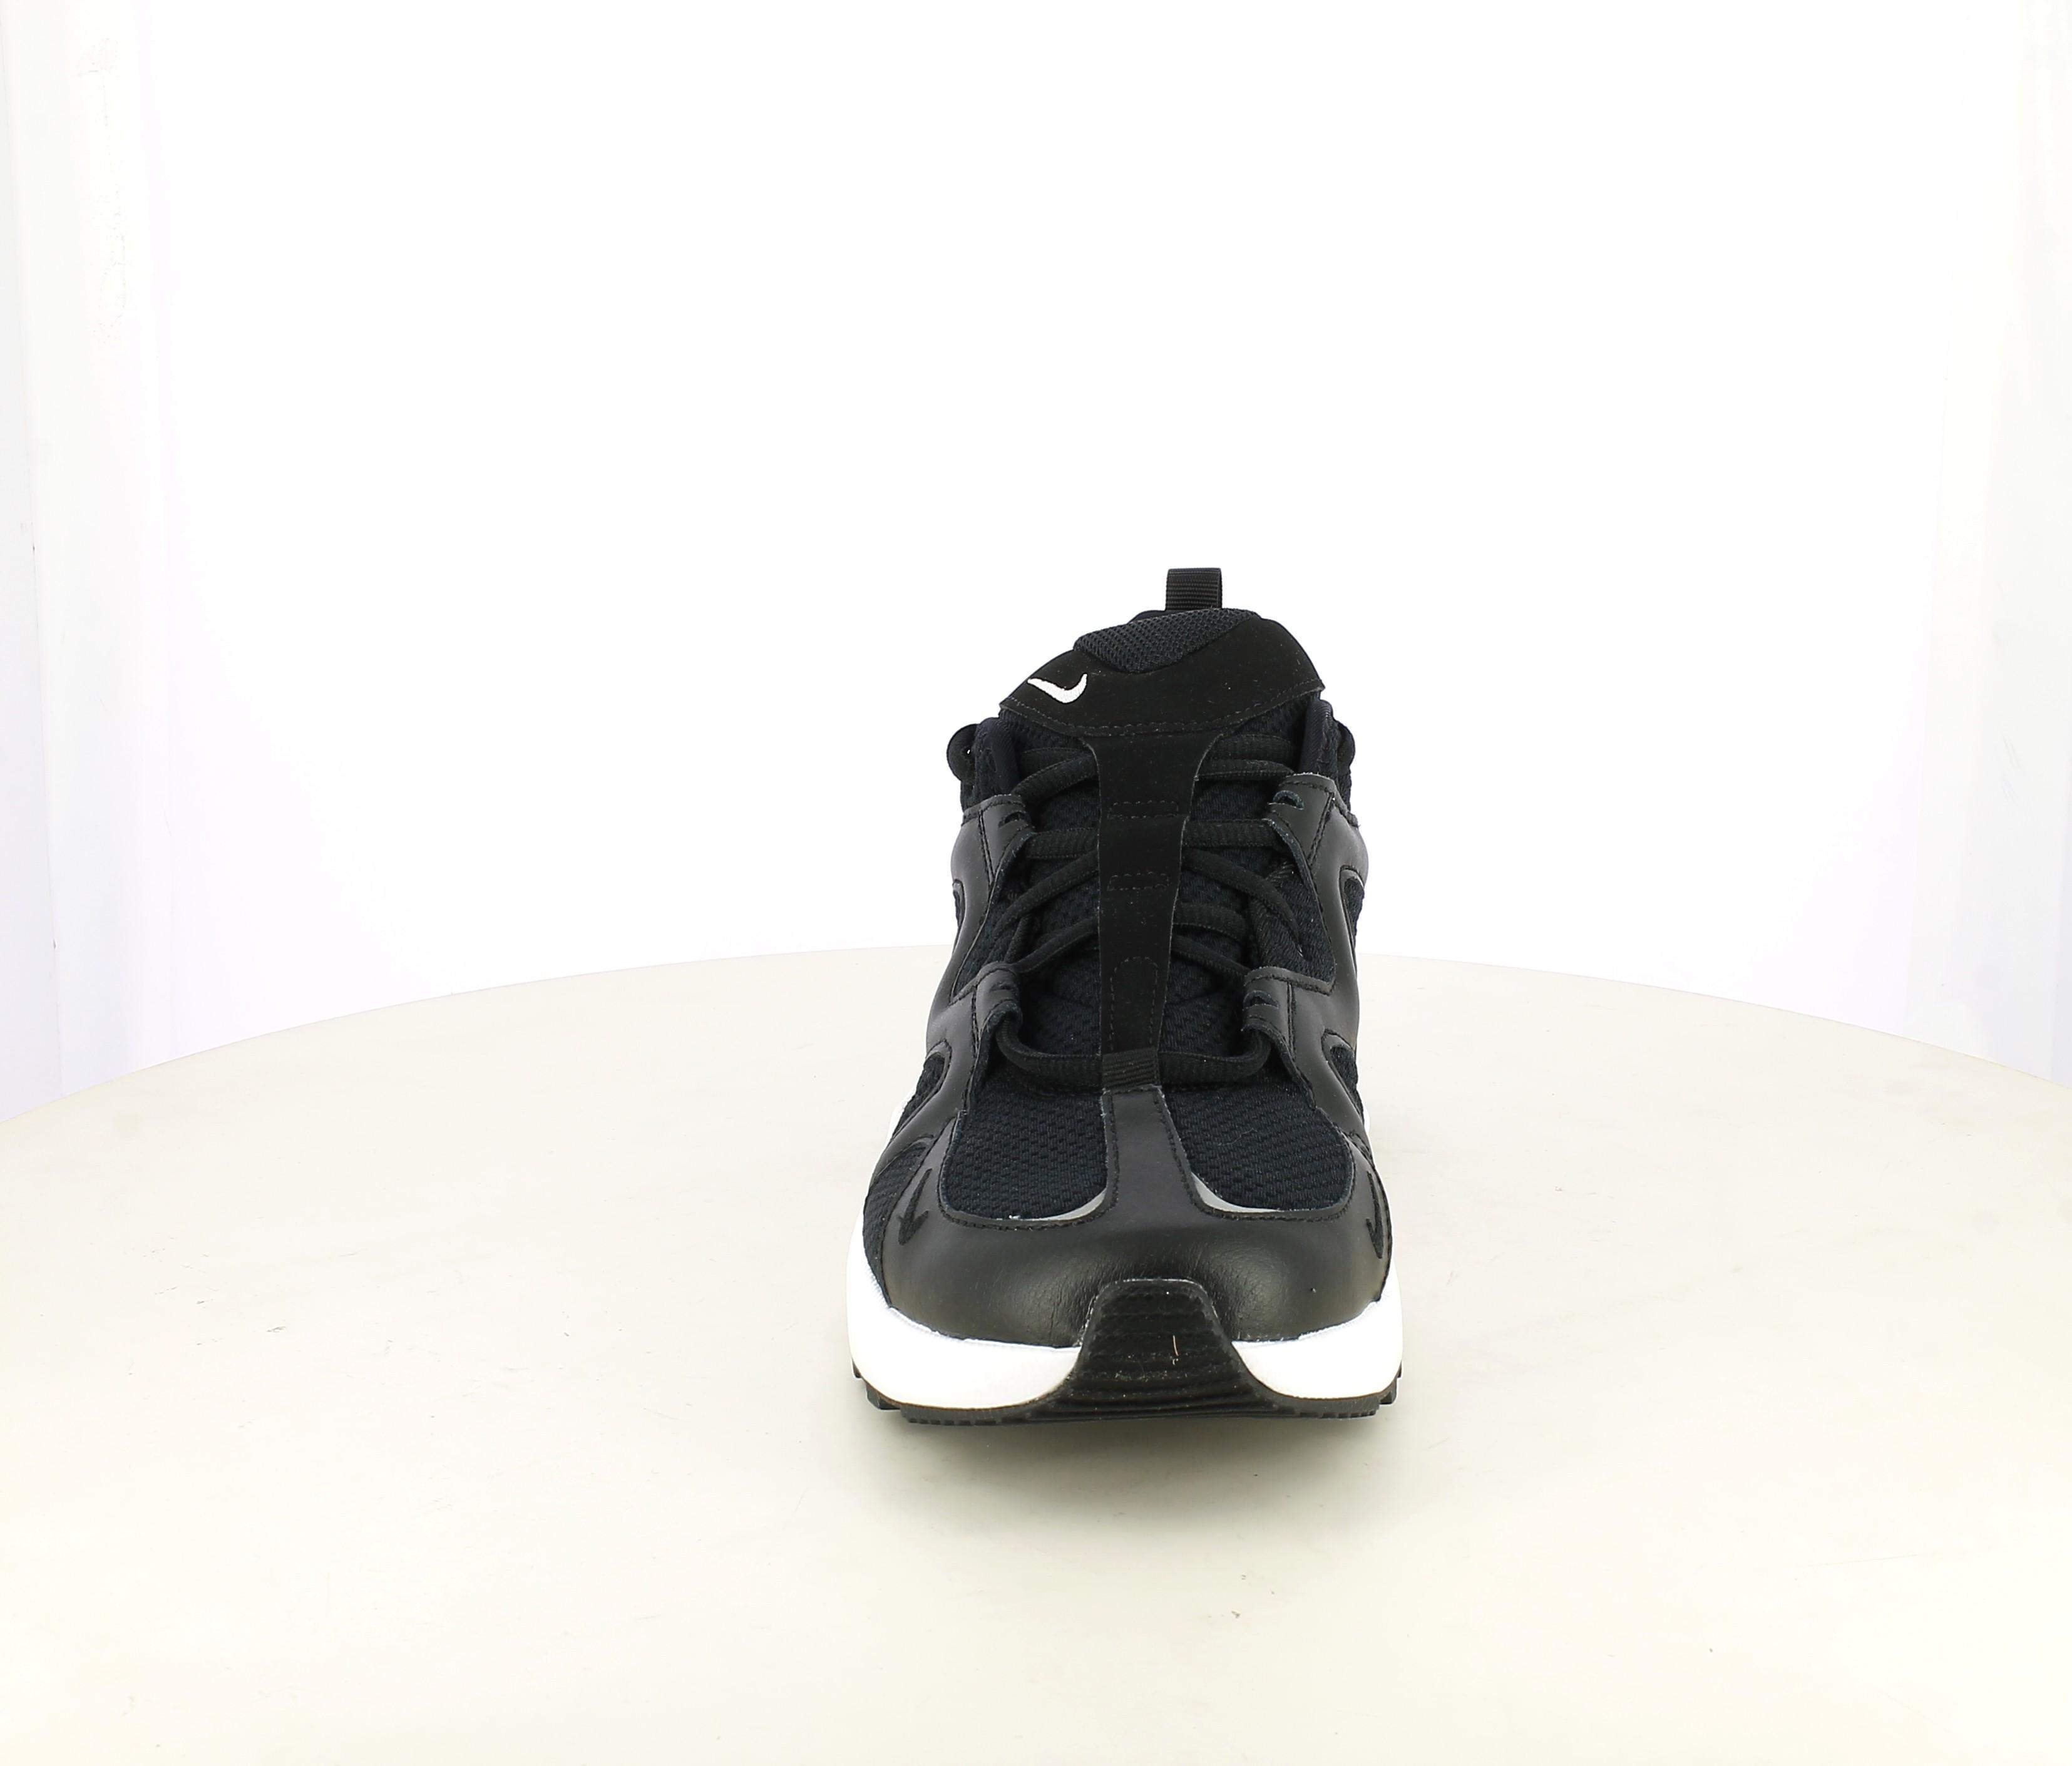 Inspiración Cadera Comercial  Zapatillas deportivas air max graviton negras con suela blanca Nike |  Querol online